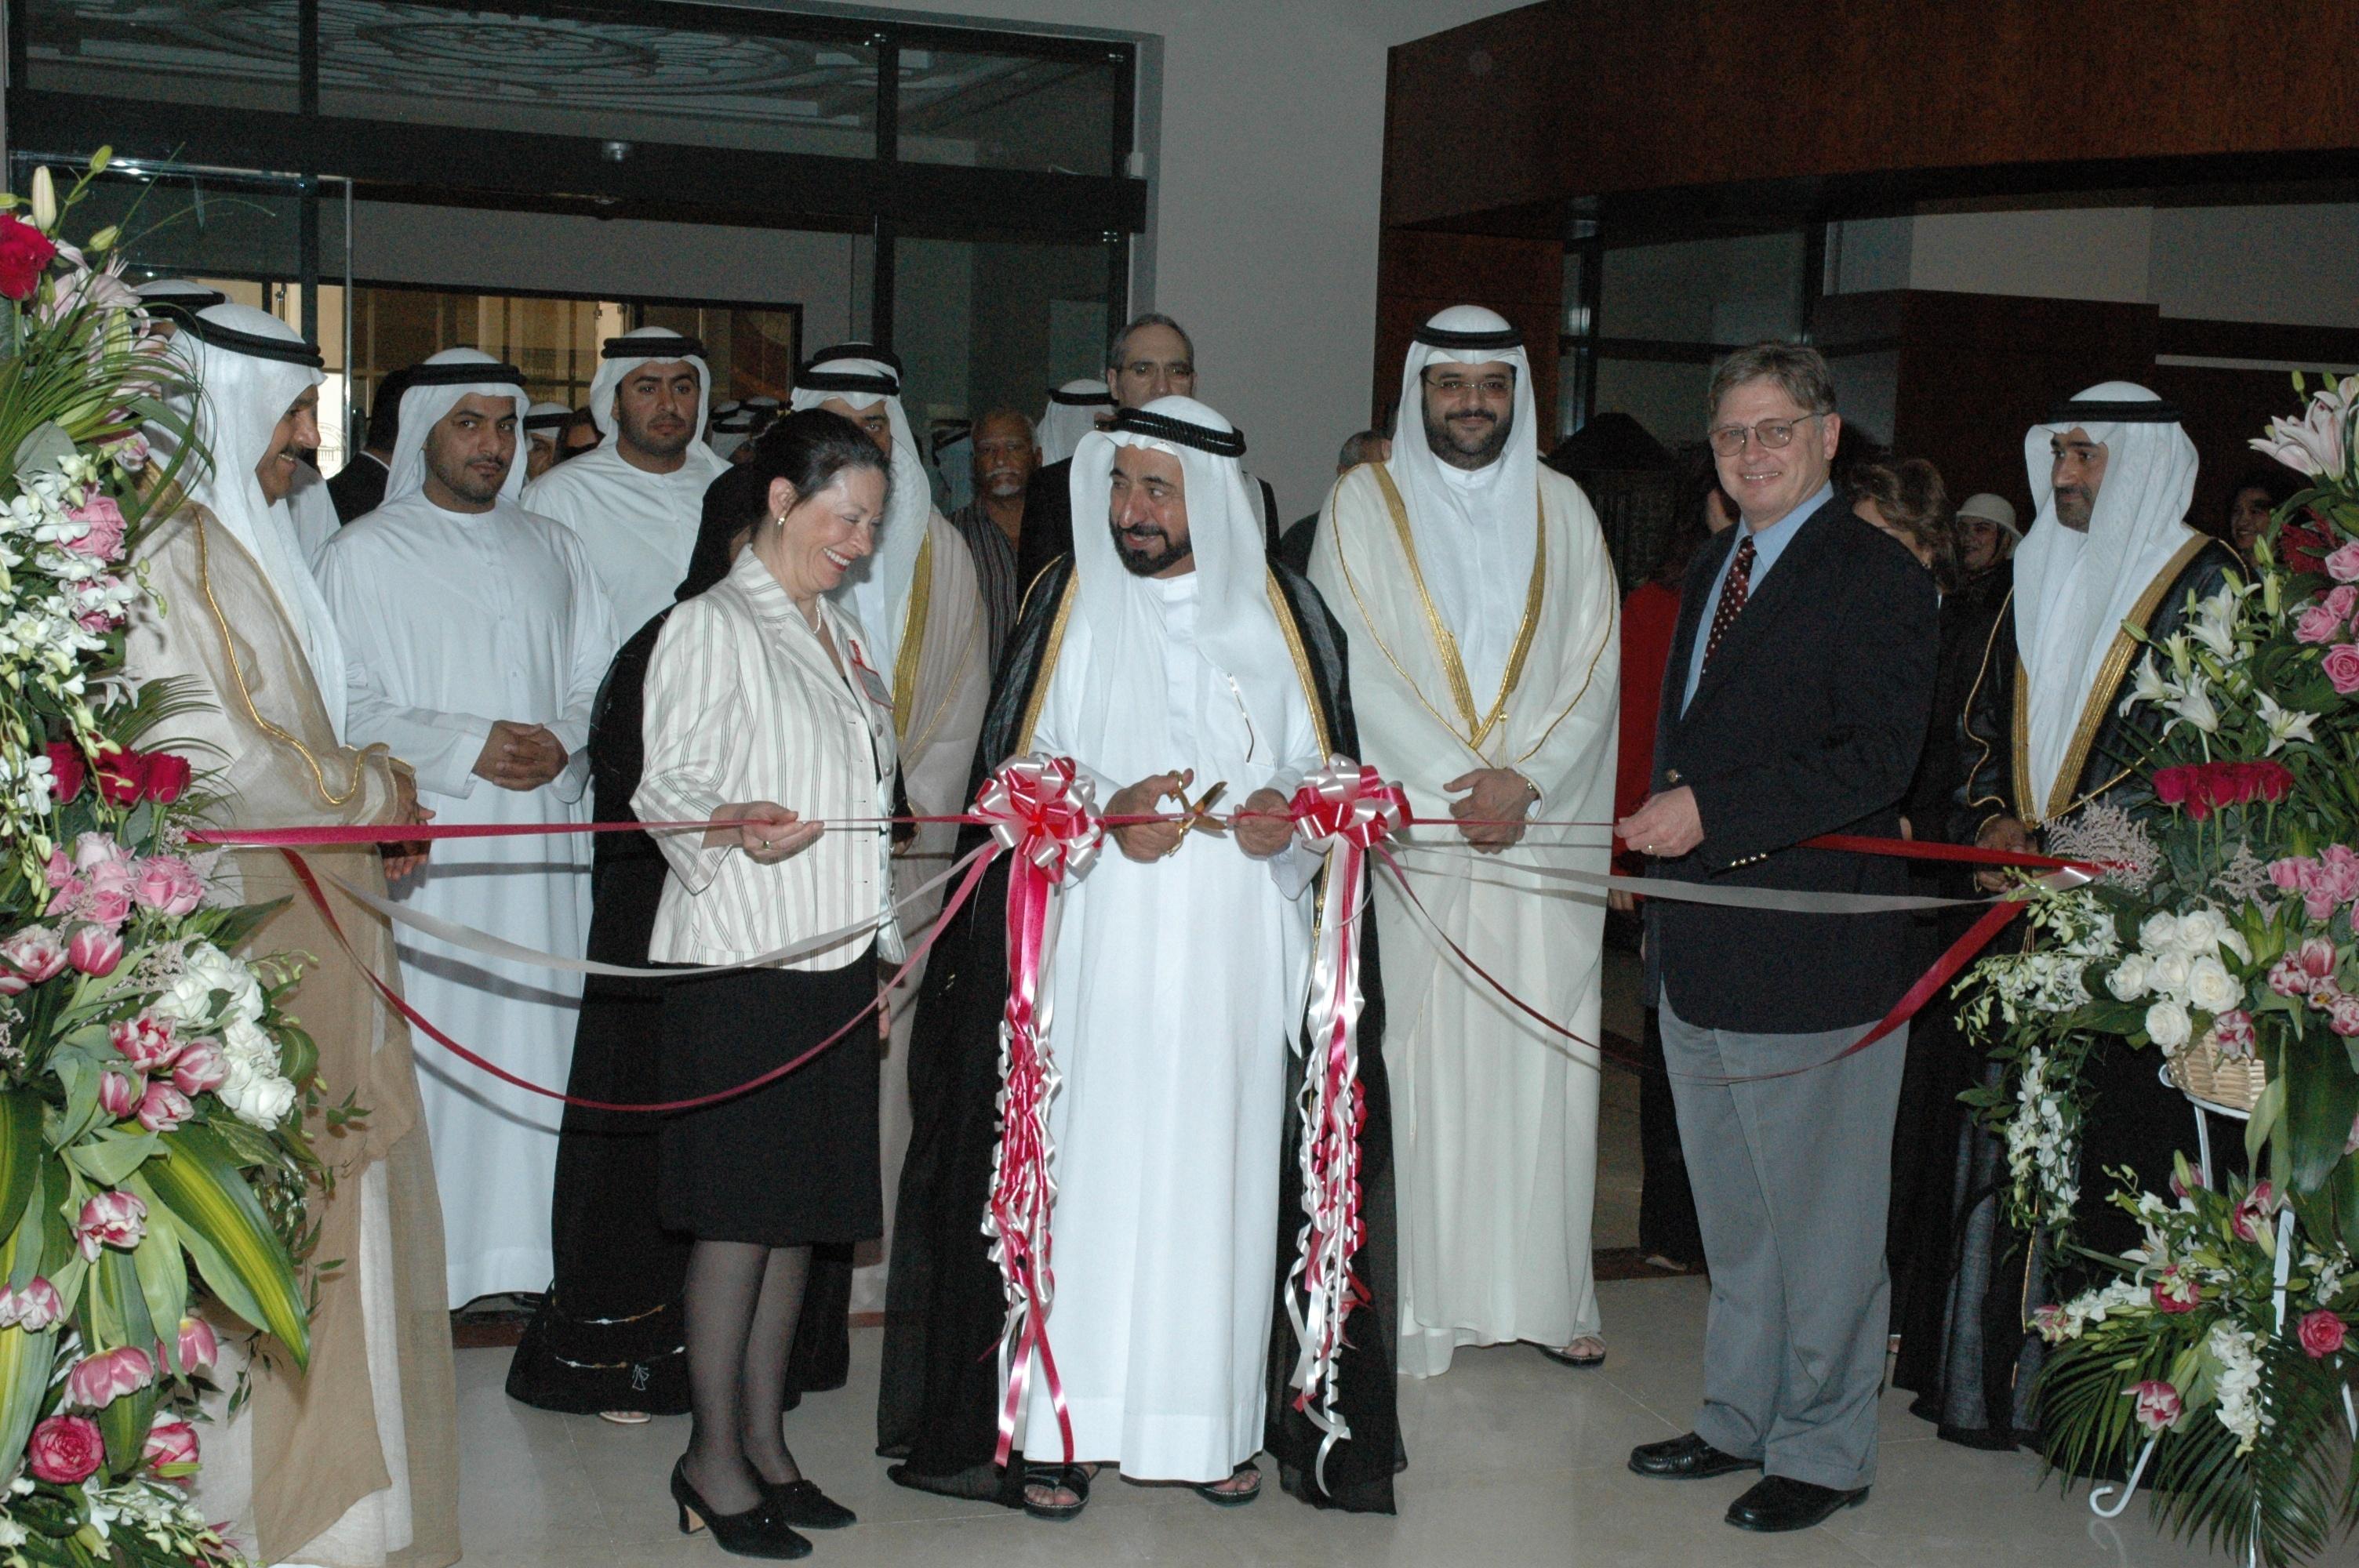 American_University_of_Sharjah_Library_2.jpg